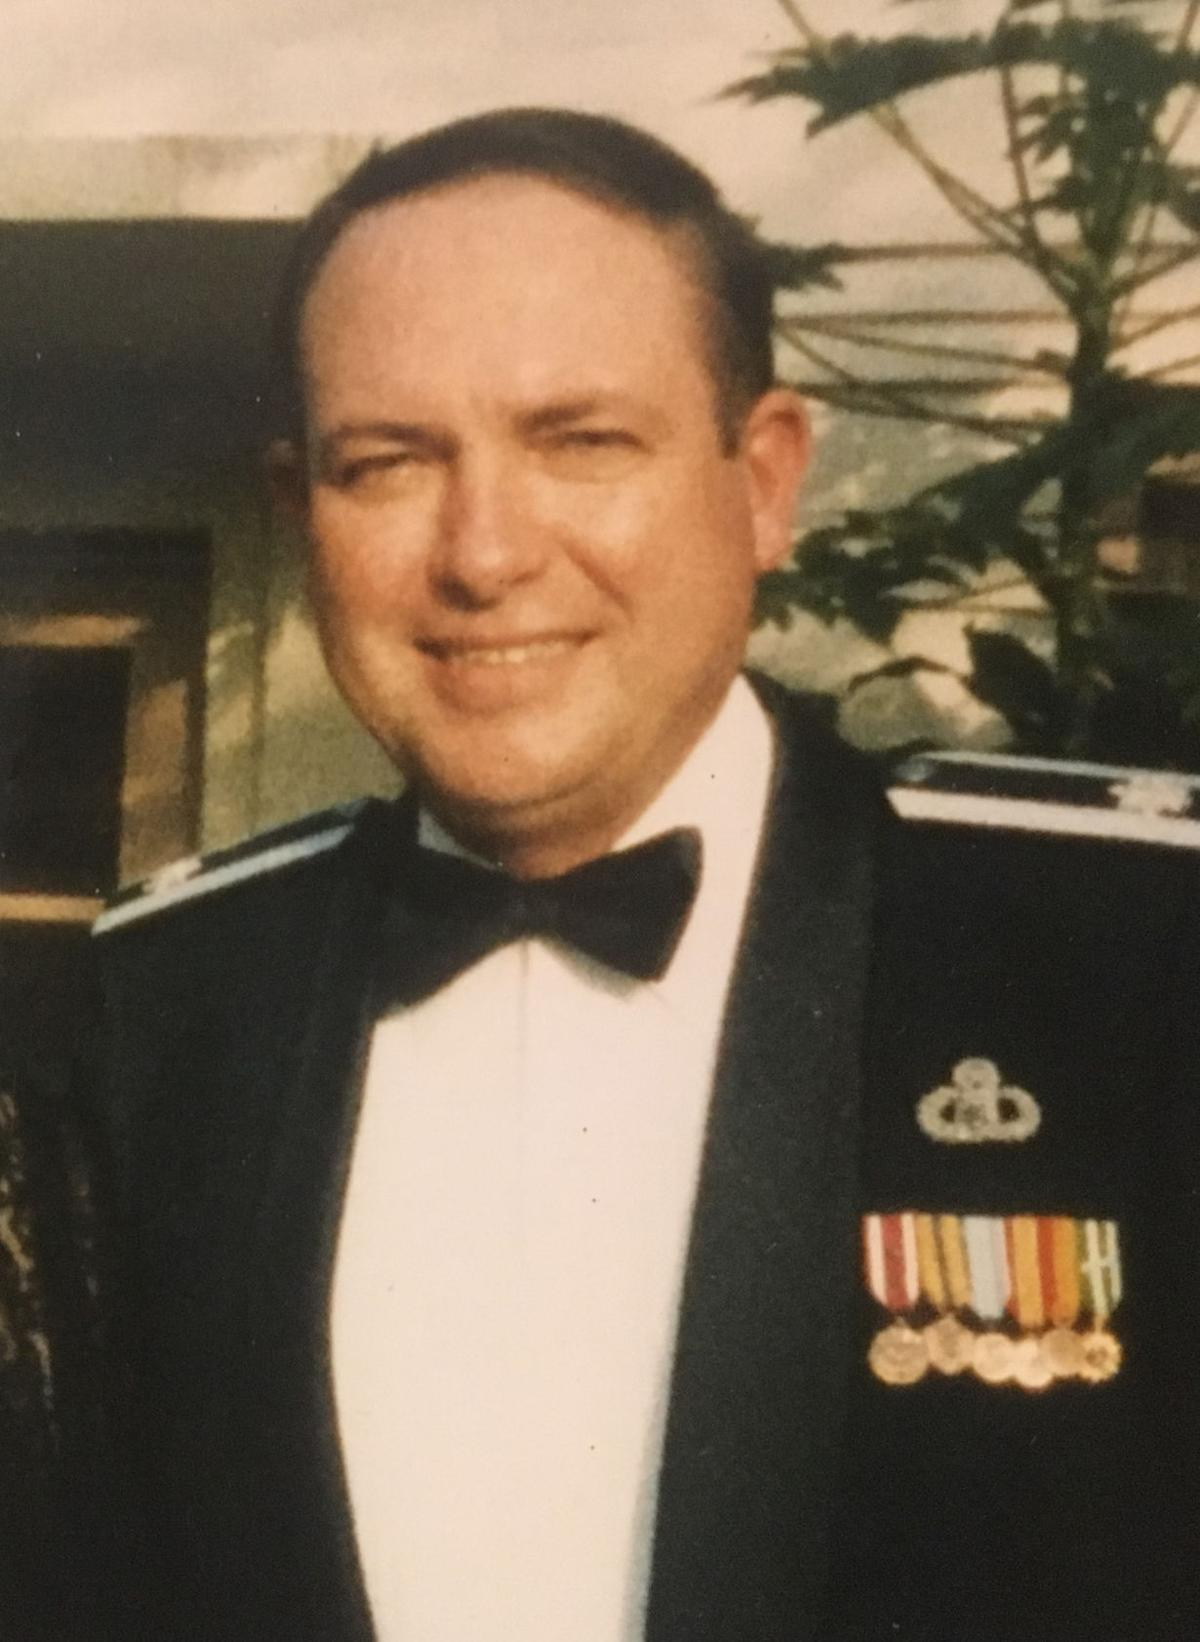 Lt. Col. Grant Van Keuren Hagge